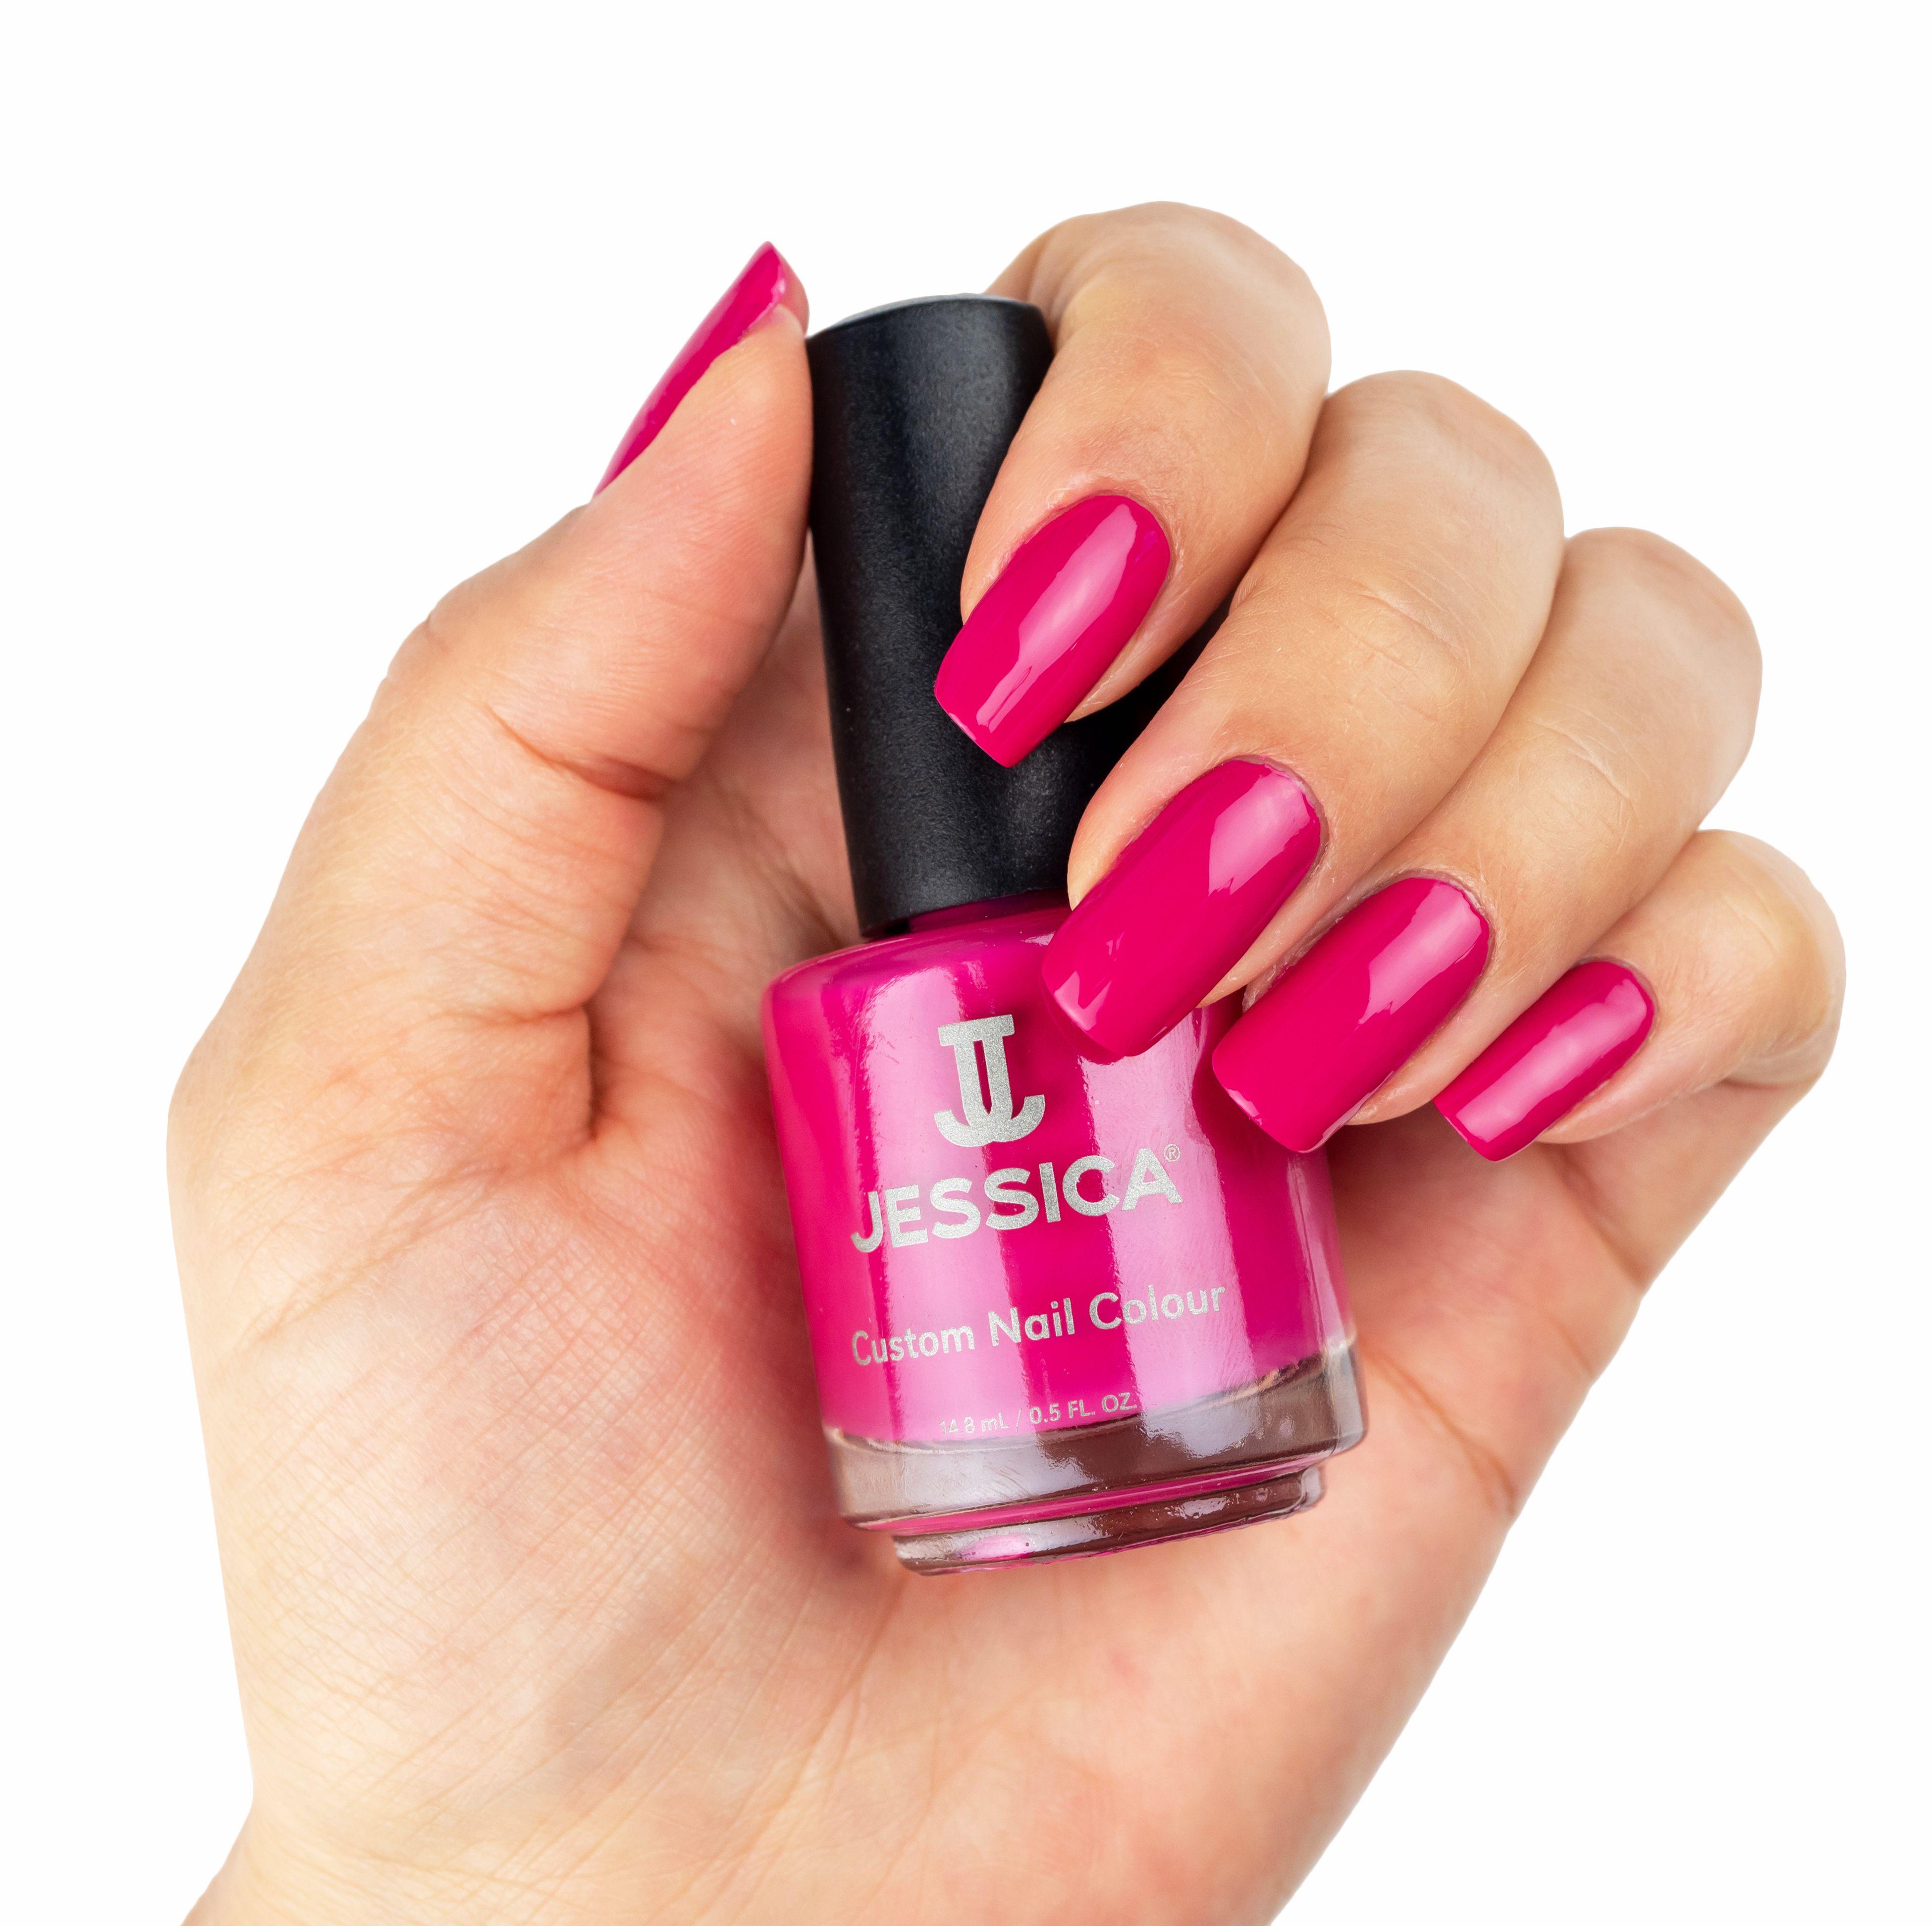 Festival Fuschia Jessica cosmetics, Nail colors, Nail polish